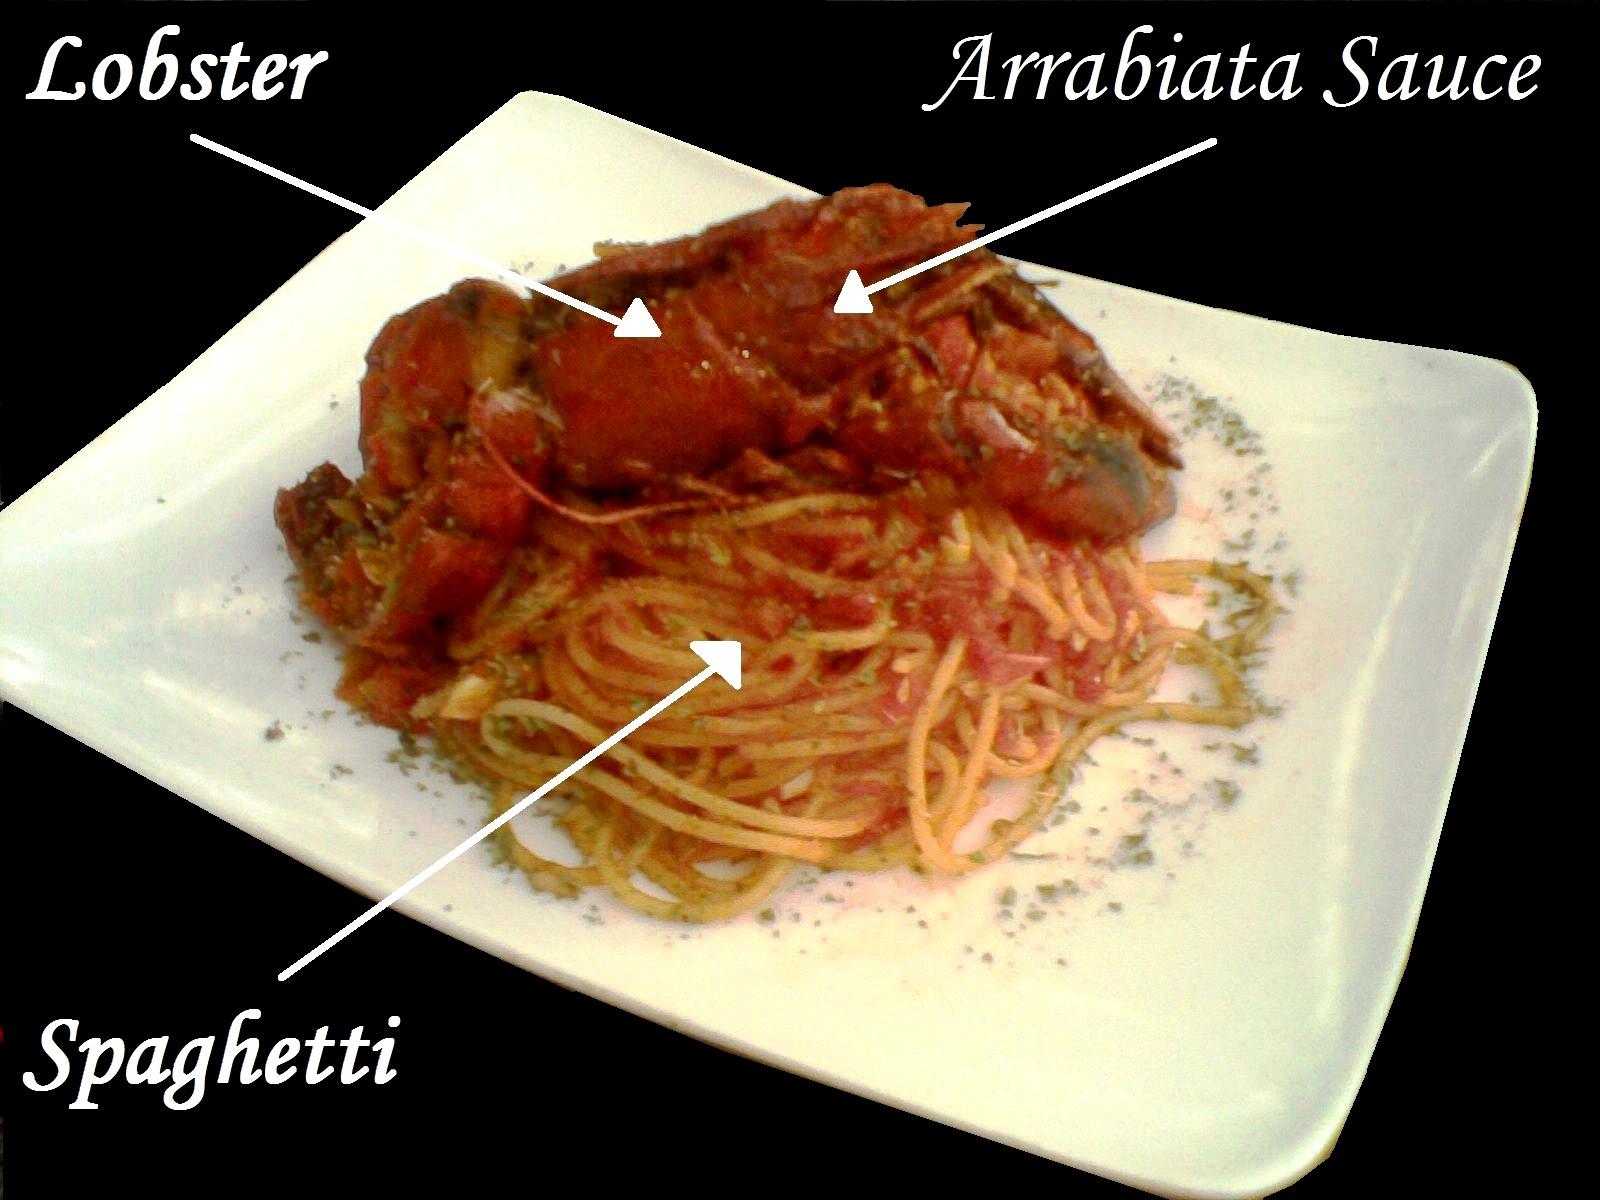 resep-lobster-spaghetti-arrabiata-sauce-cryfish Beberapa macam Pasta